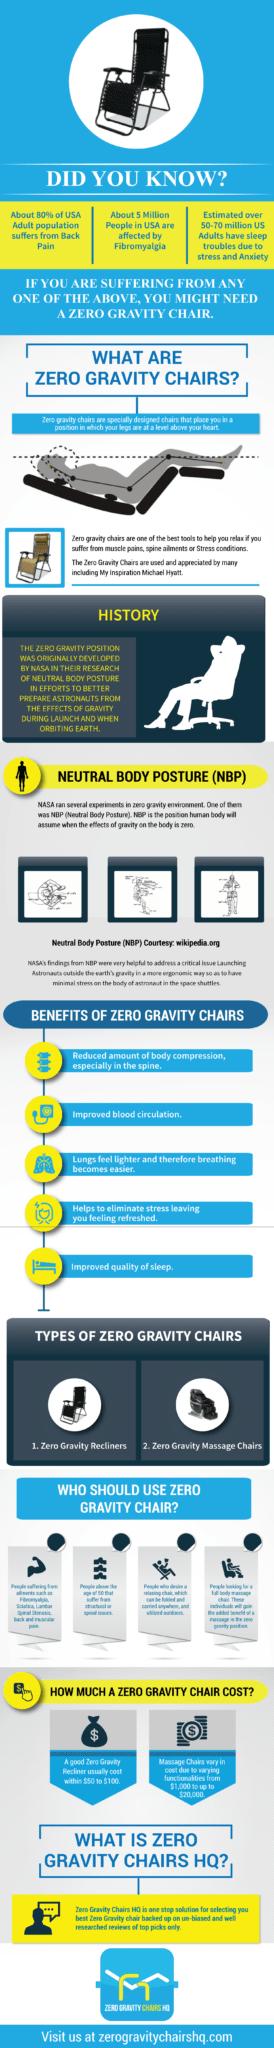 zero gravity chair infographic